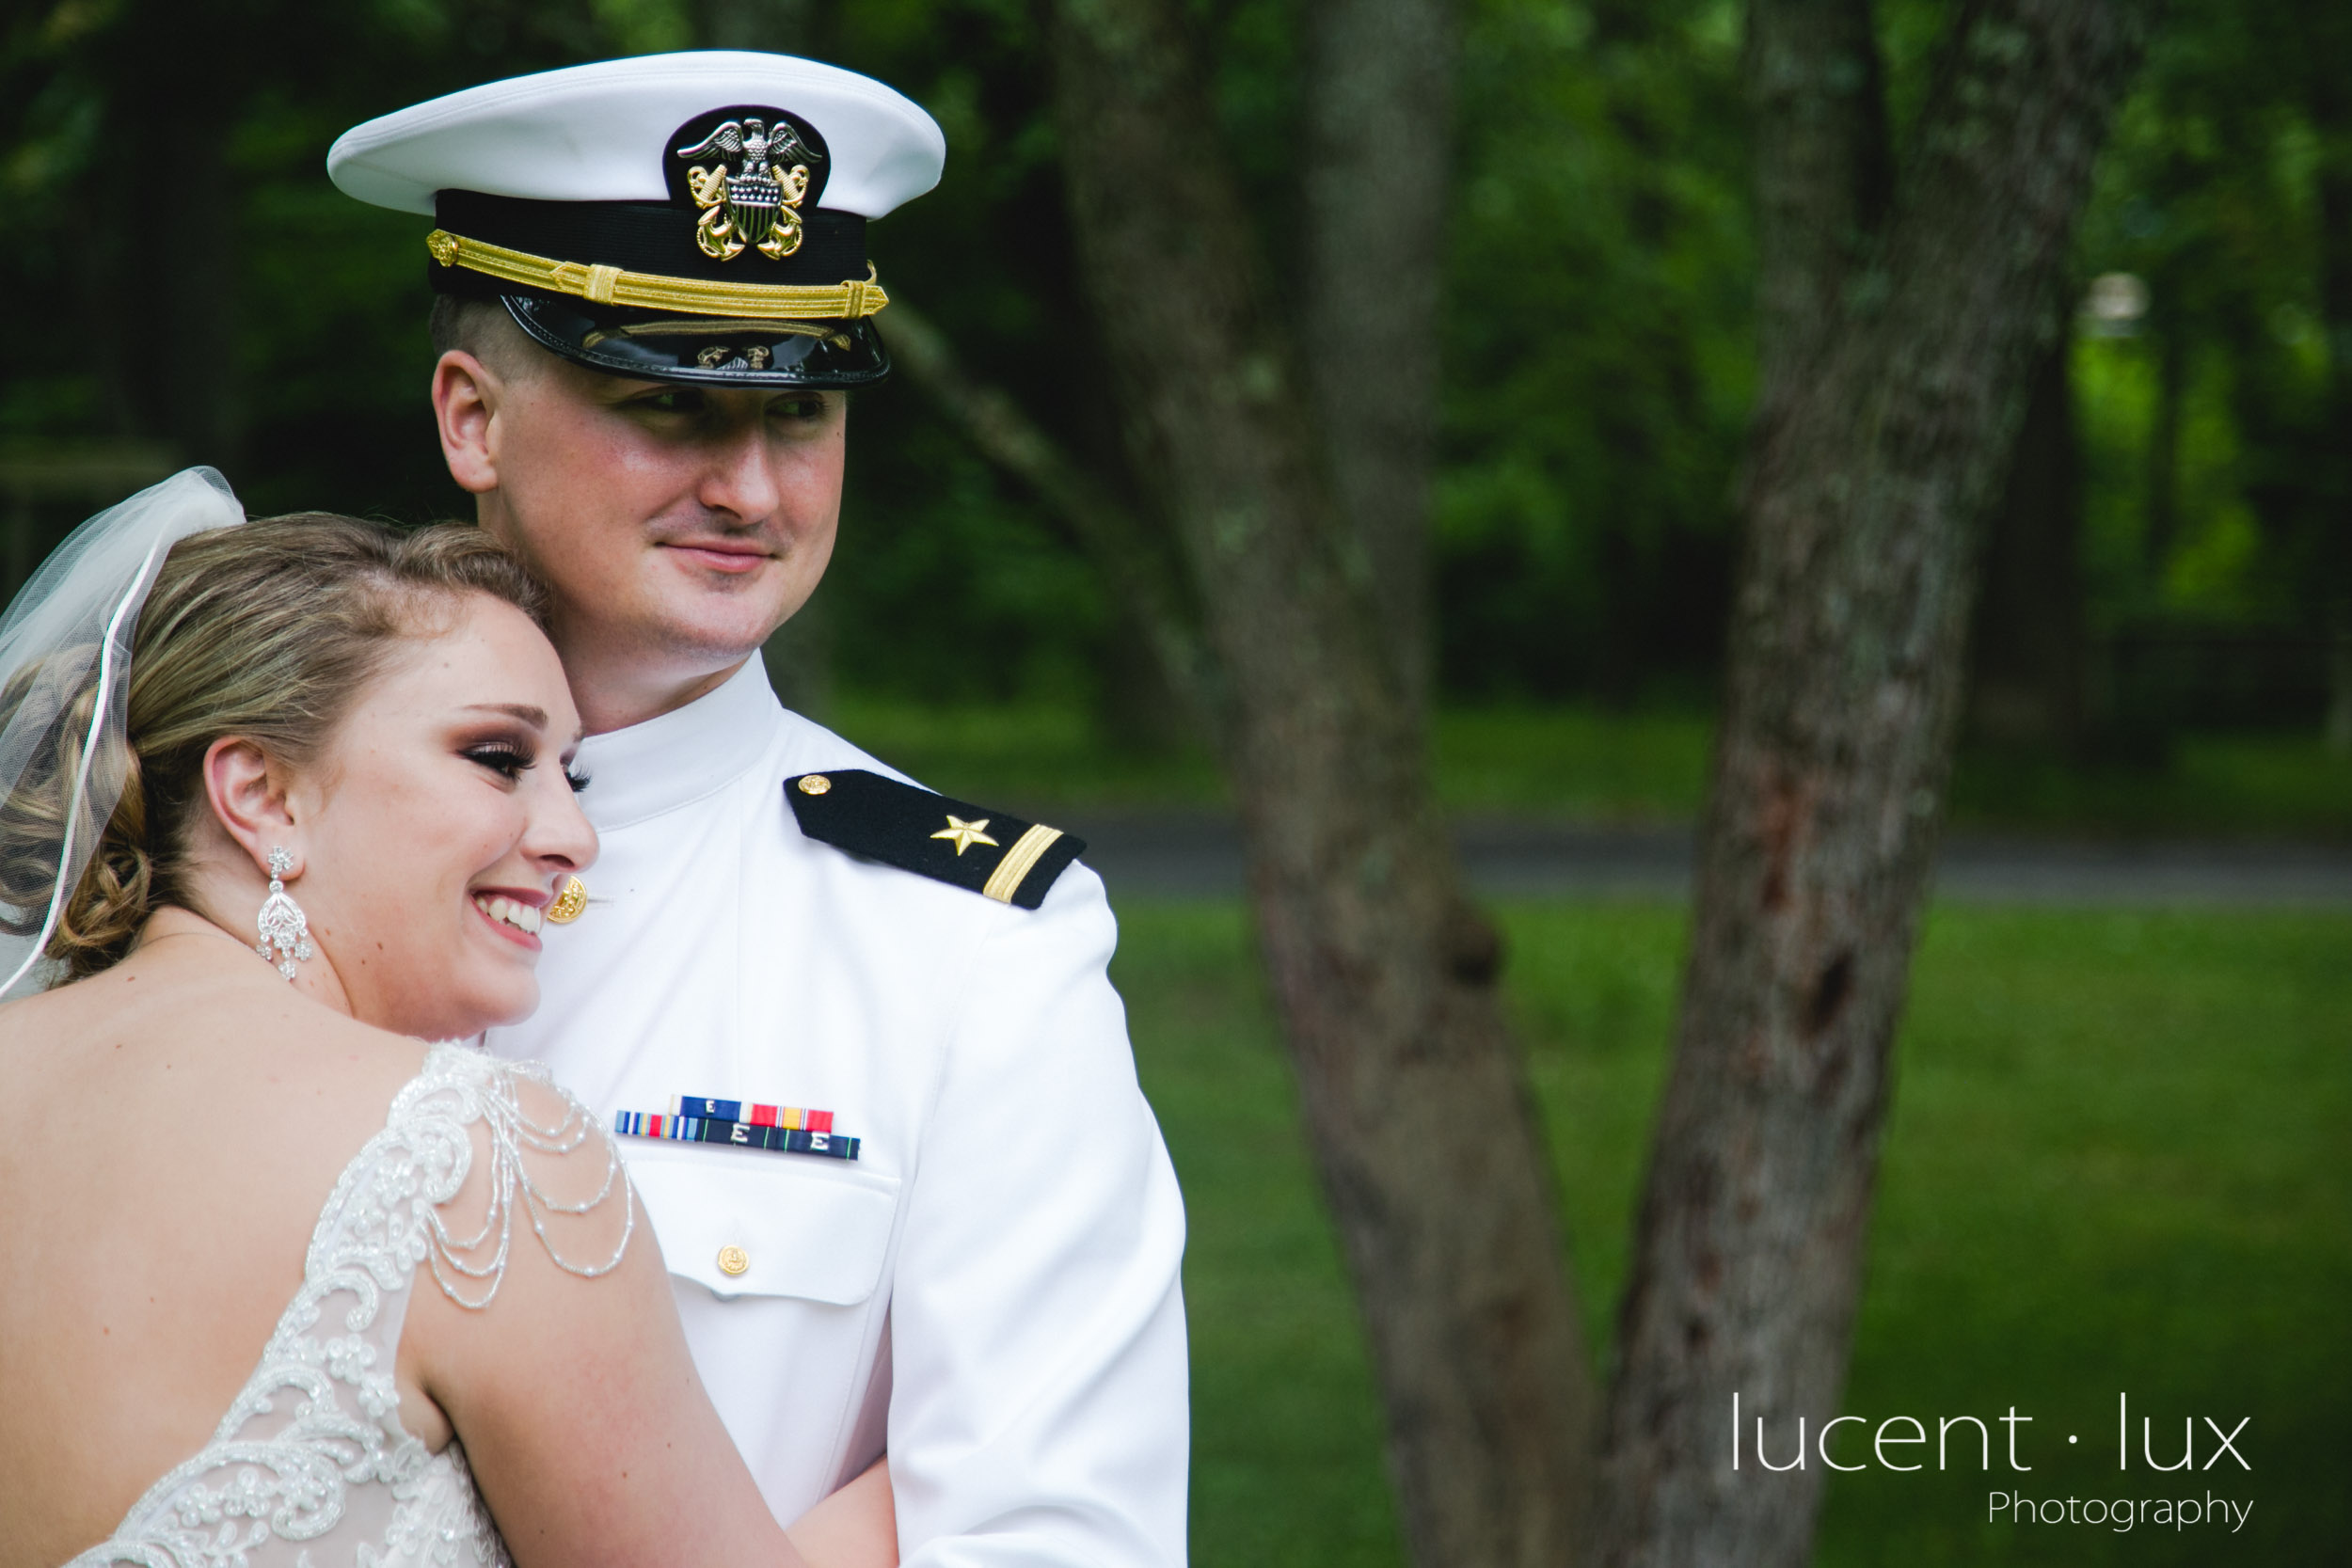 Wedding-Photography-Maryland-Pennsylvania-Photographer-Mendenhall-Inn-Media-Portrait-Event-133.jpg